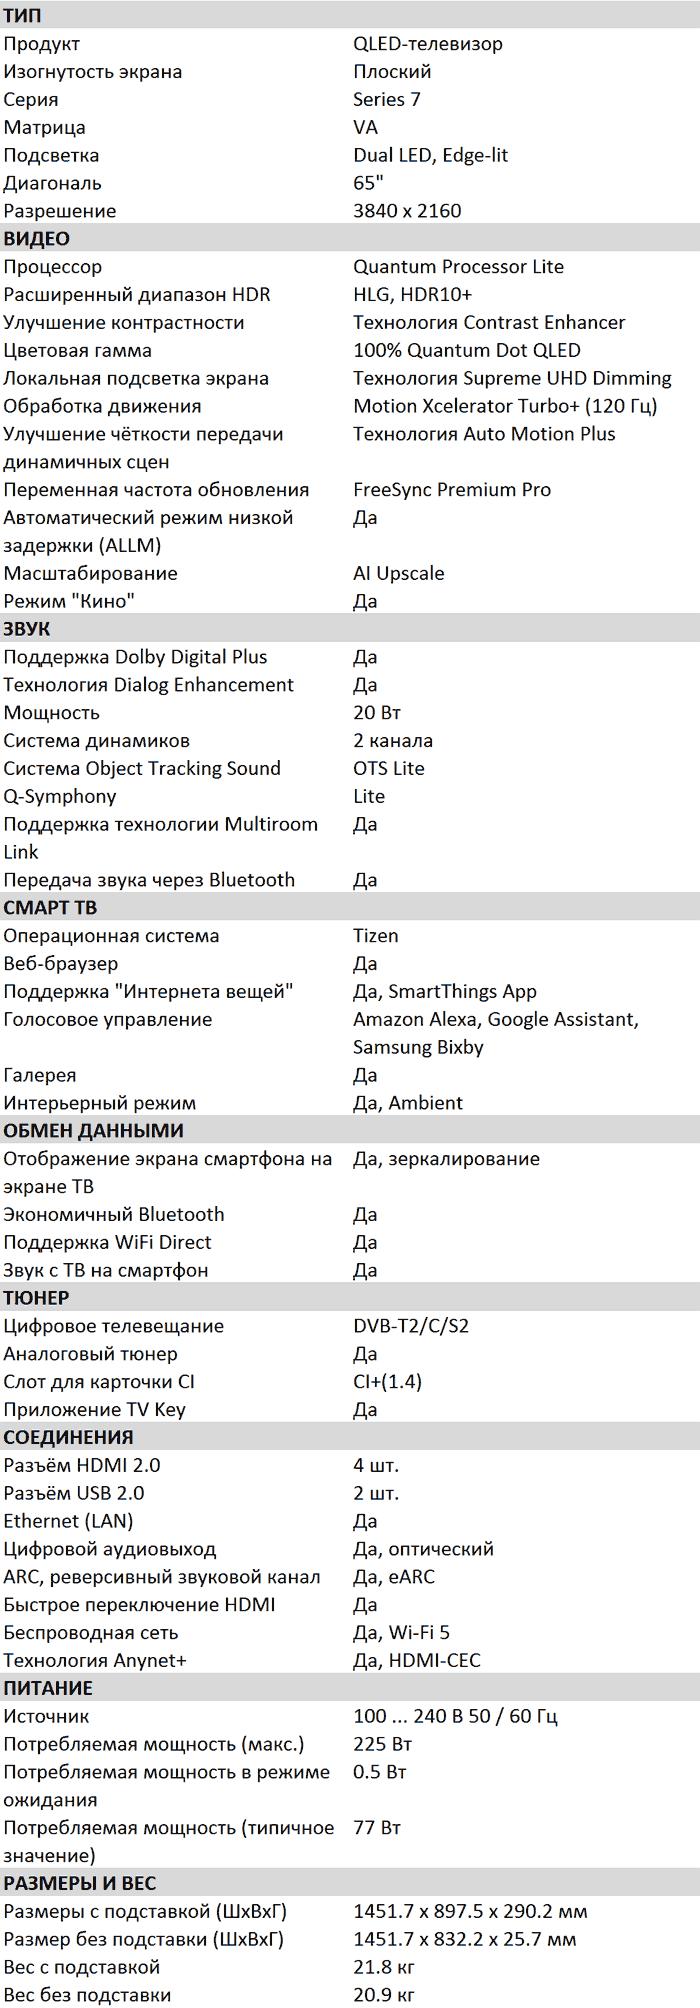 Характеристики Q70A